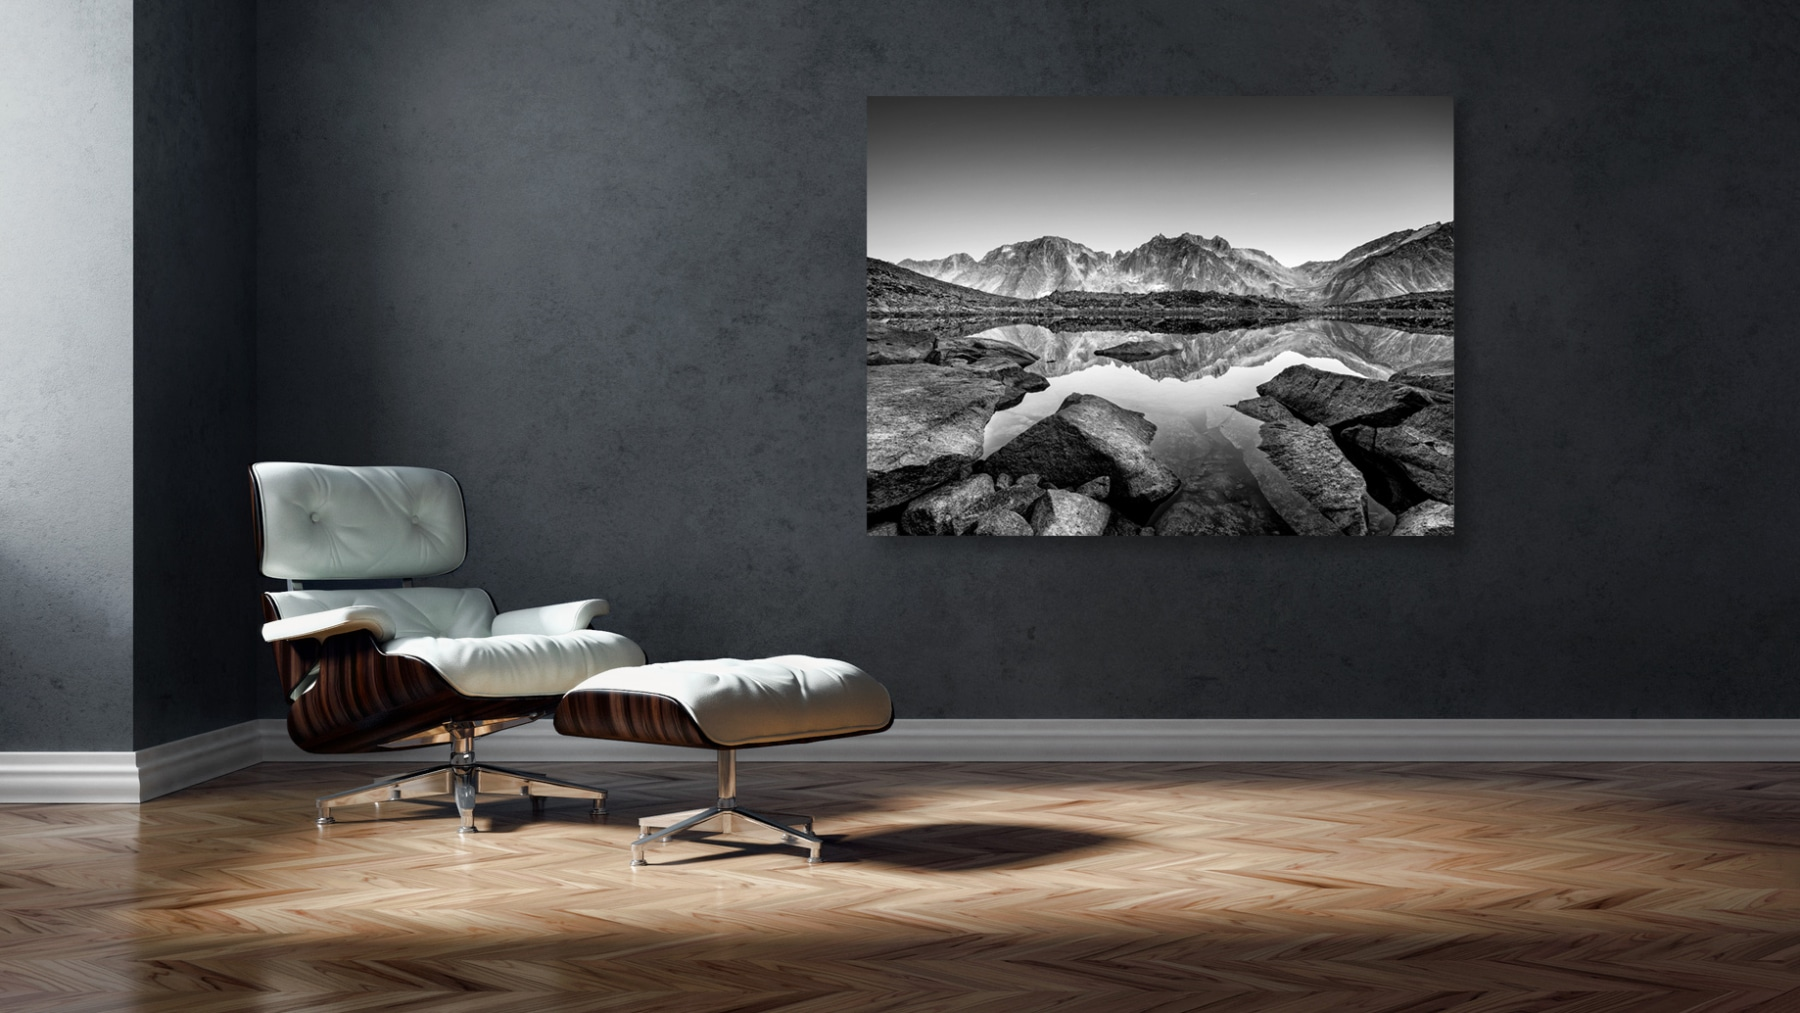 Switzerland, Mountain, Göeschenenalp, Lake, Bergsee, black and white study © by Gerry Pacher